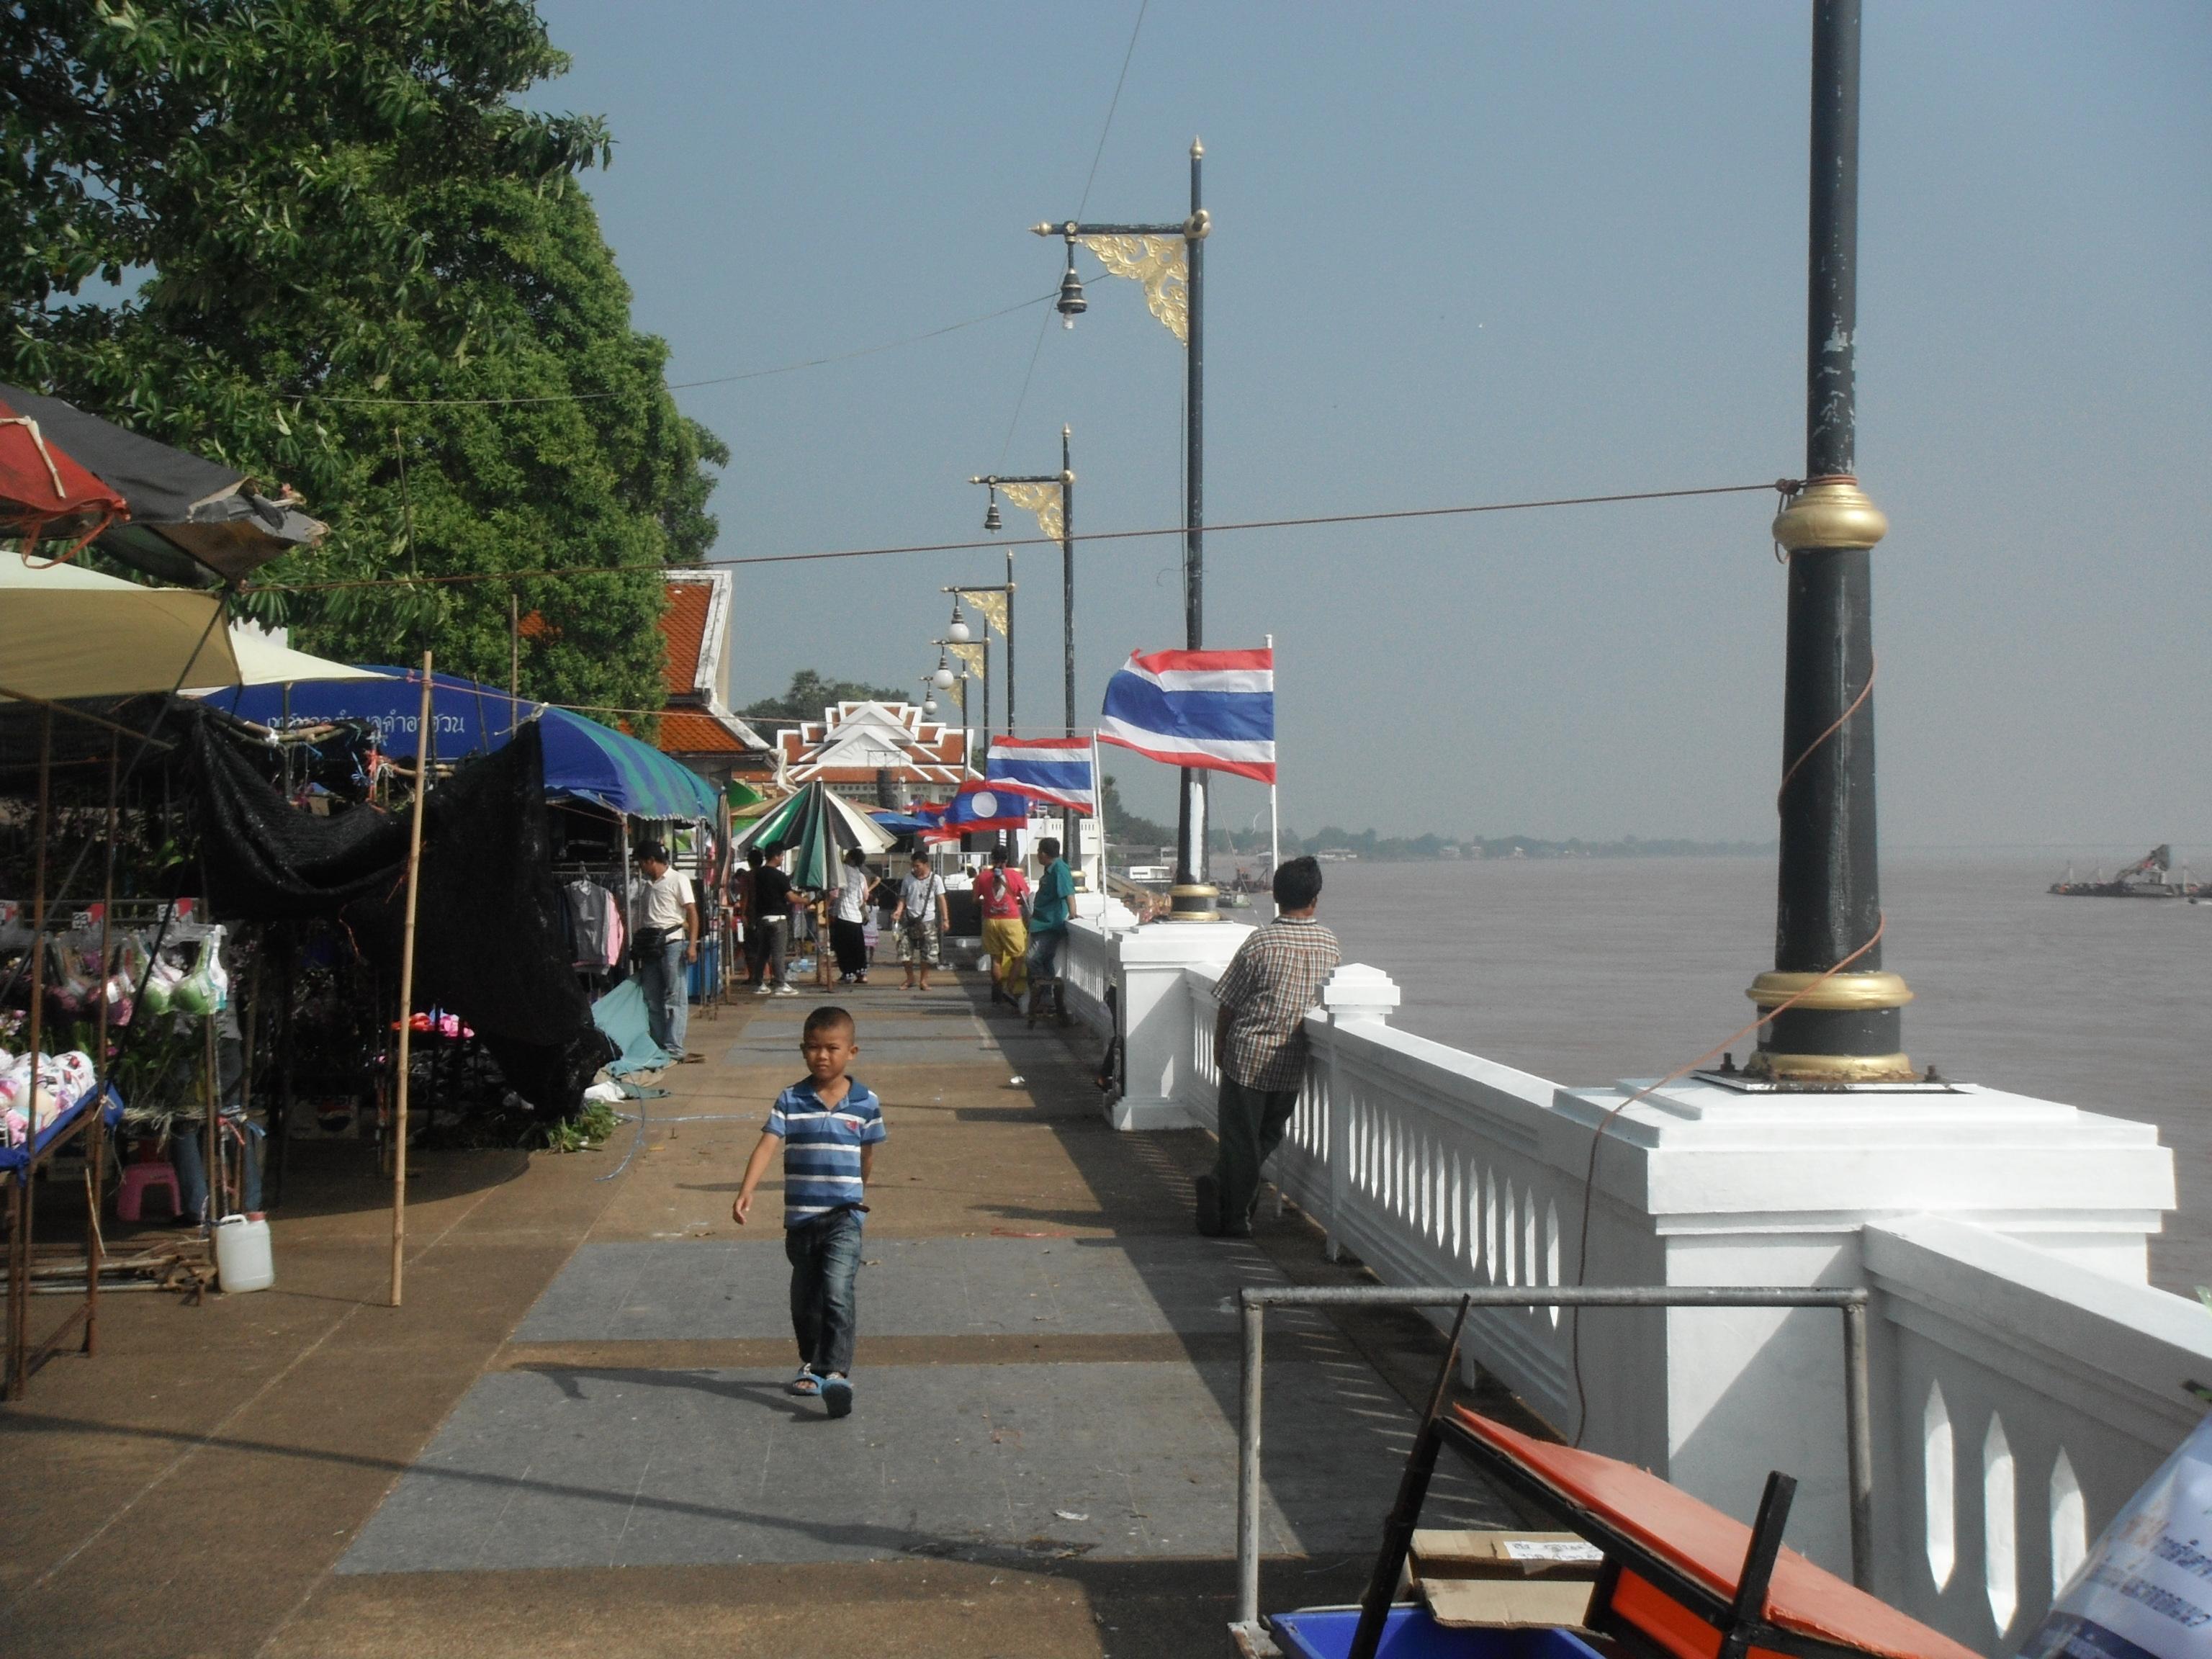 File:ตลาดอินโดจีน (Indo - China market) - panoramio.jpg - Wikimedia Commons